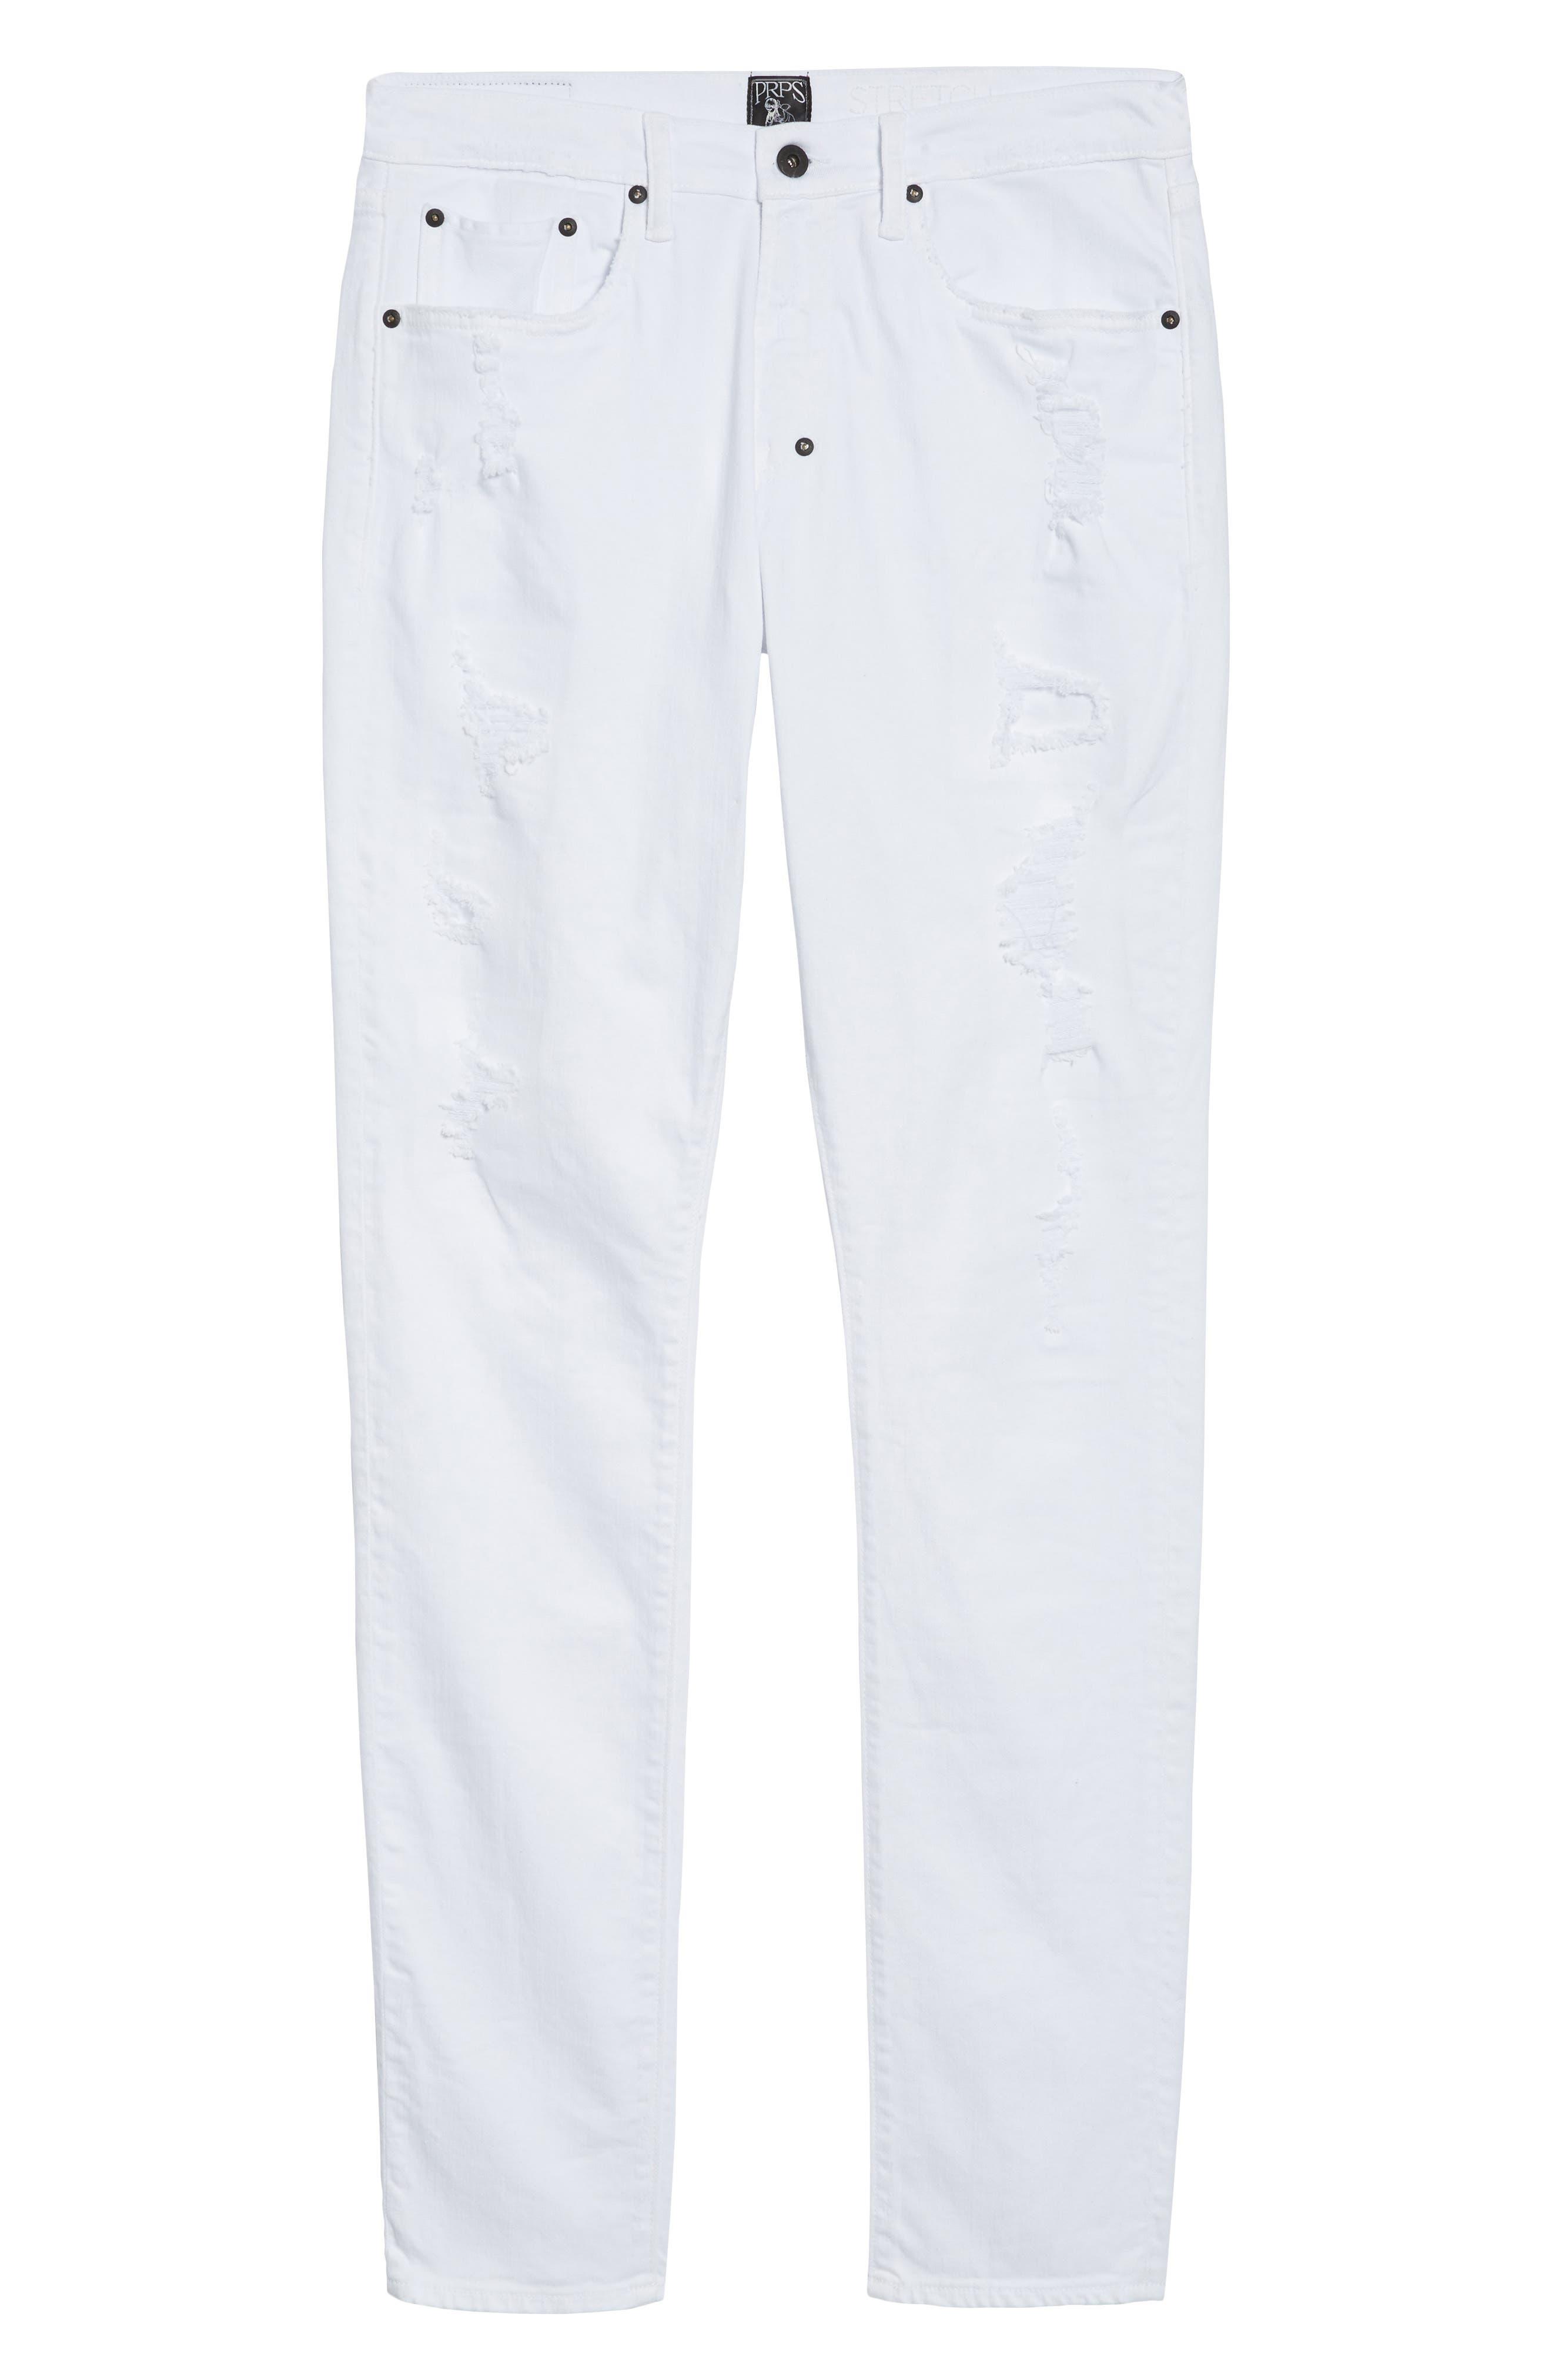 Windsor Slim Fit Jeans,                             Alternate thumbnail 6, color,                             Living White